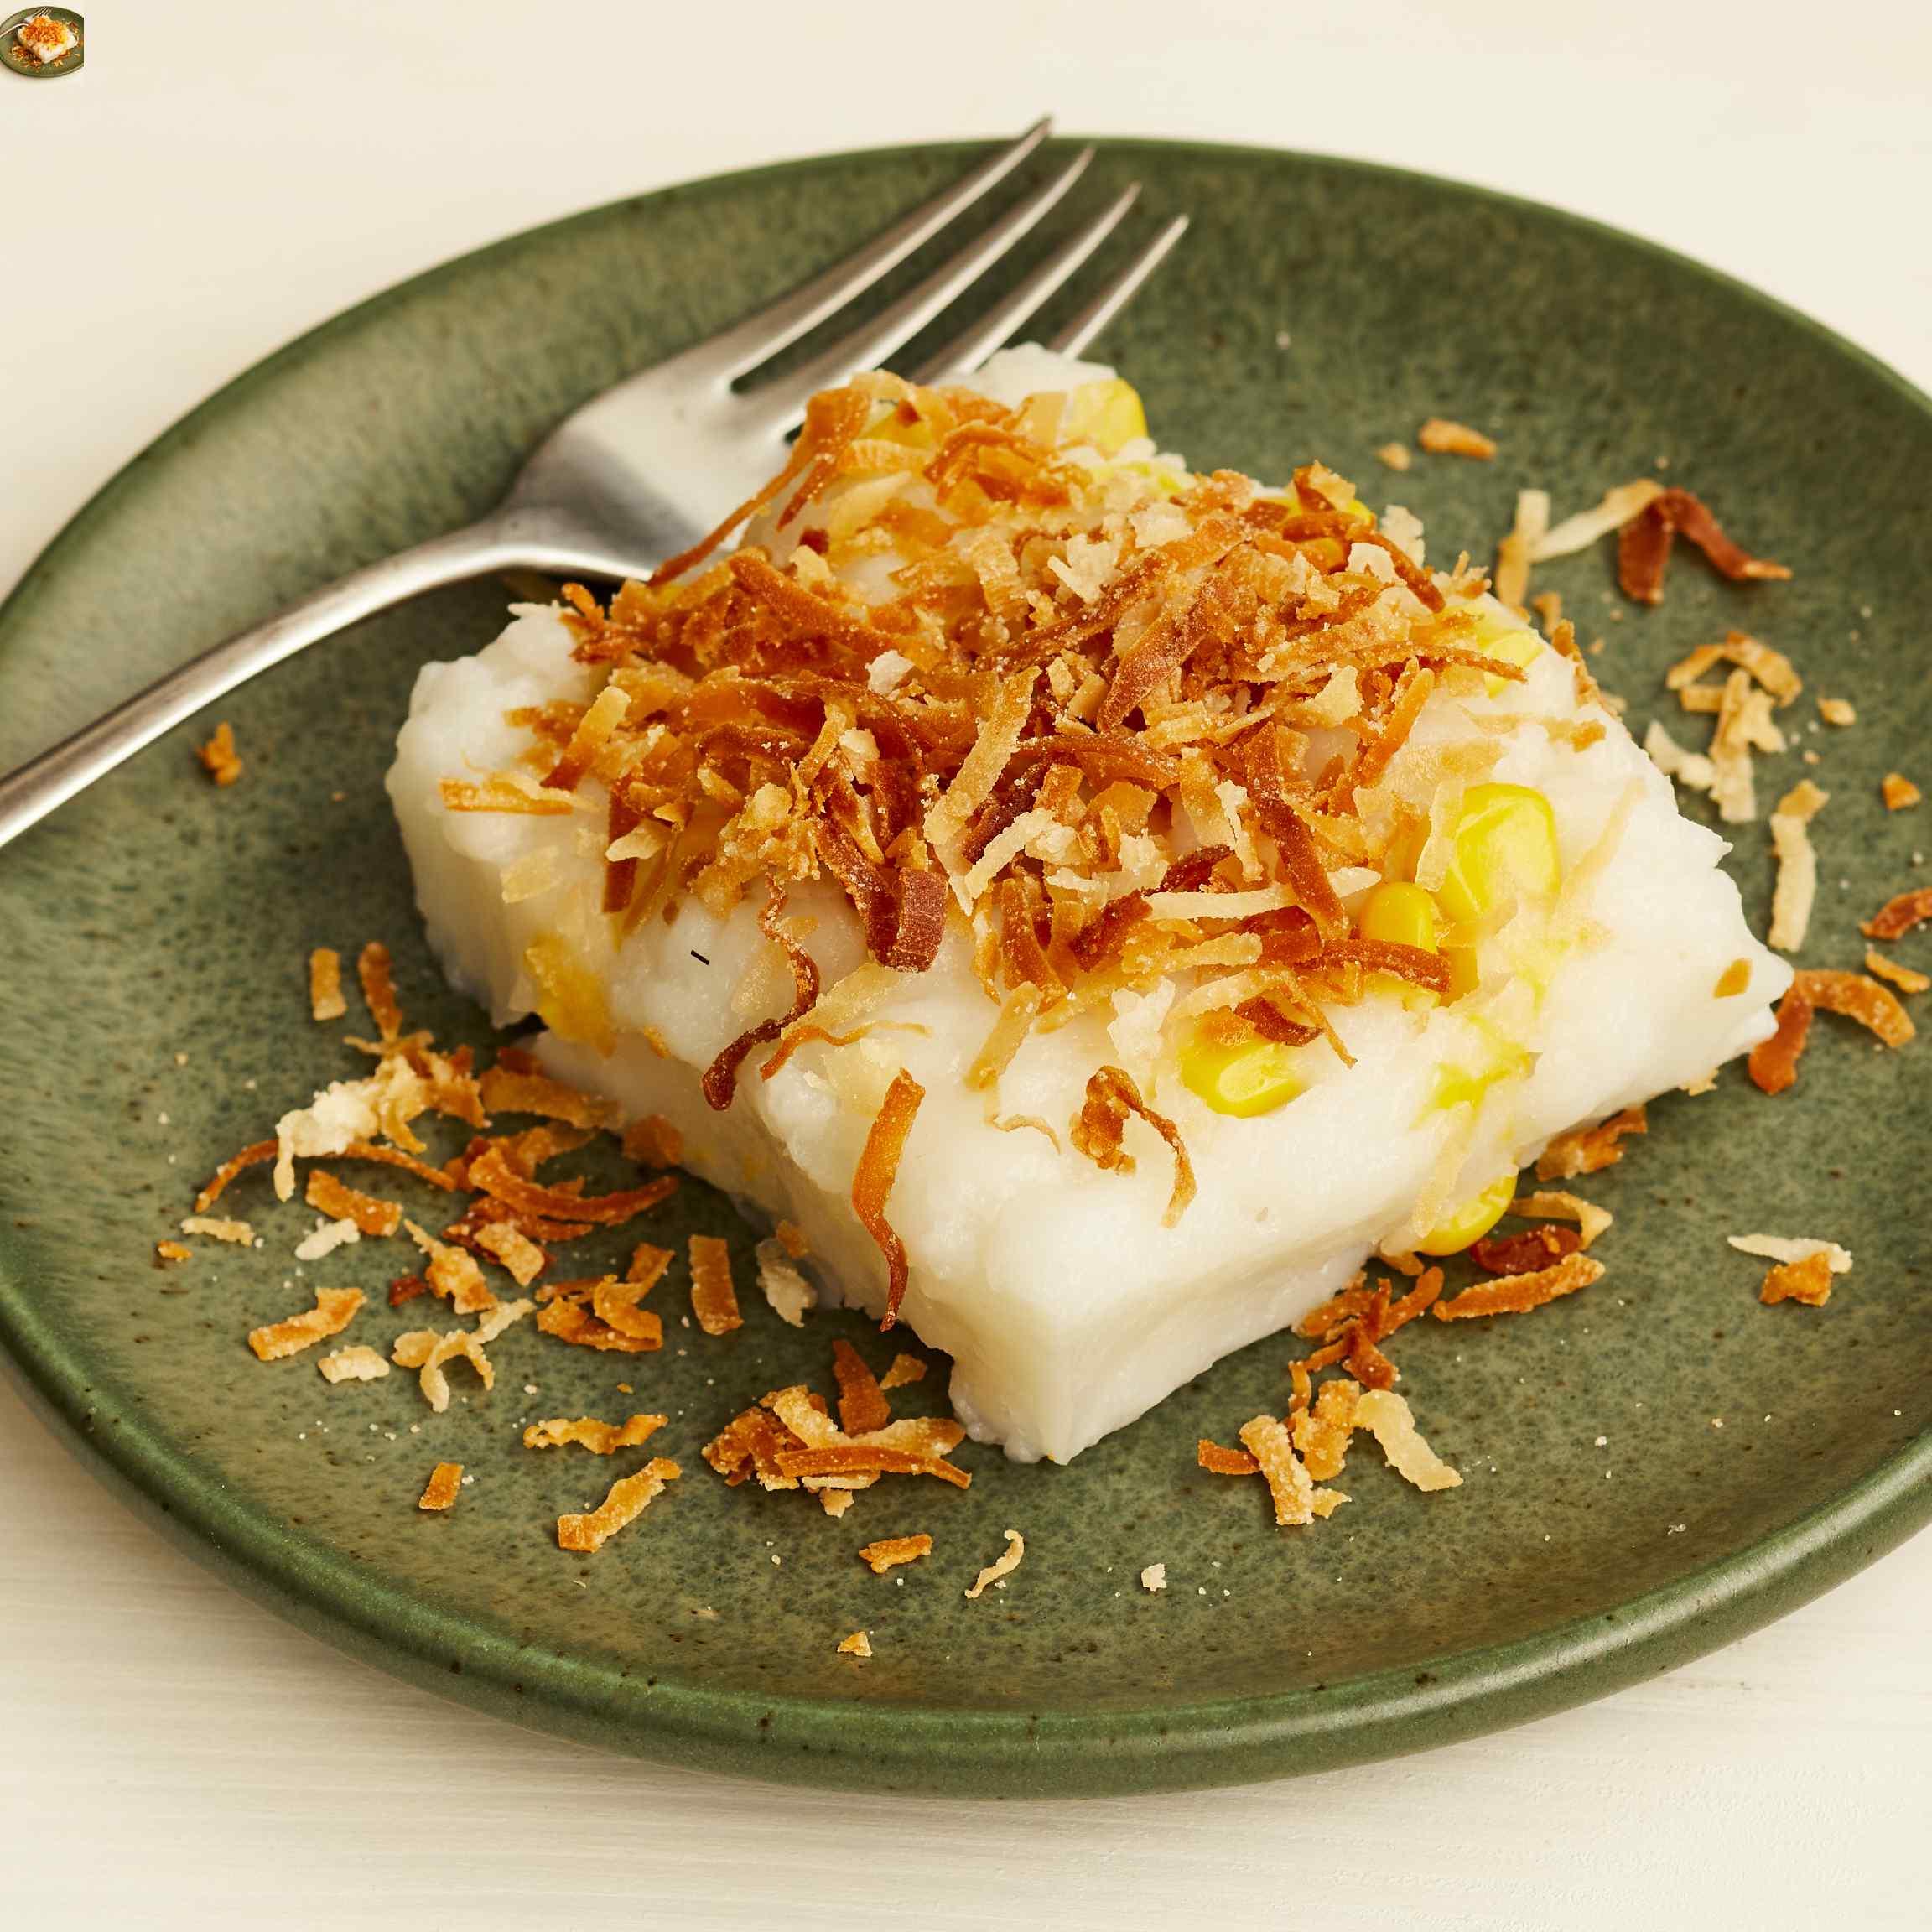 Maja Blanca (Coconut Pudding)